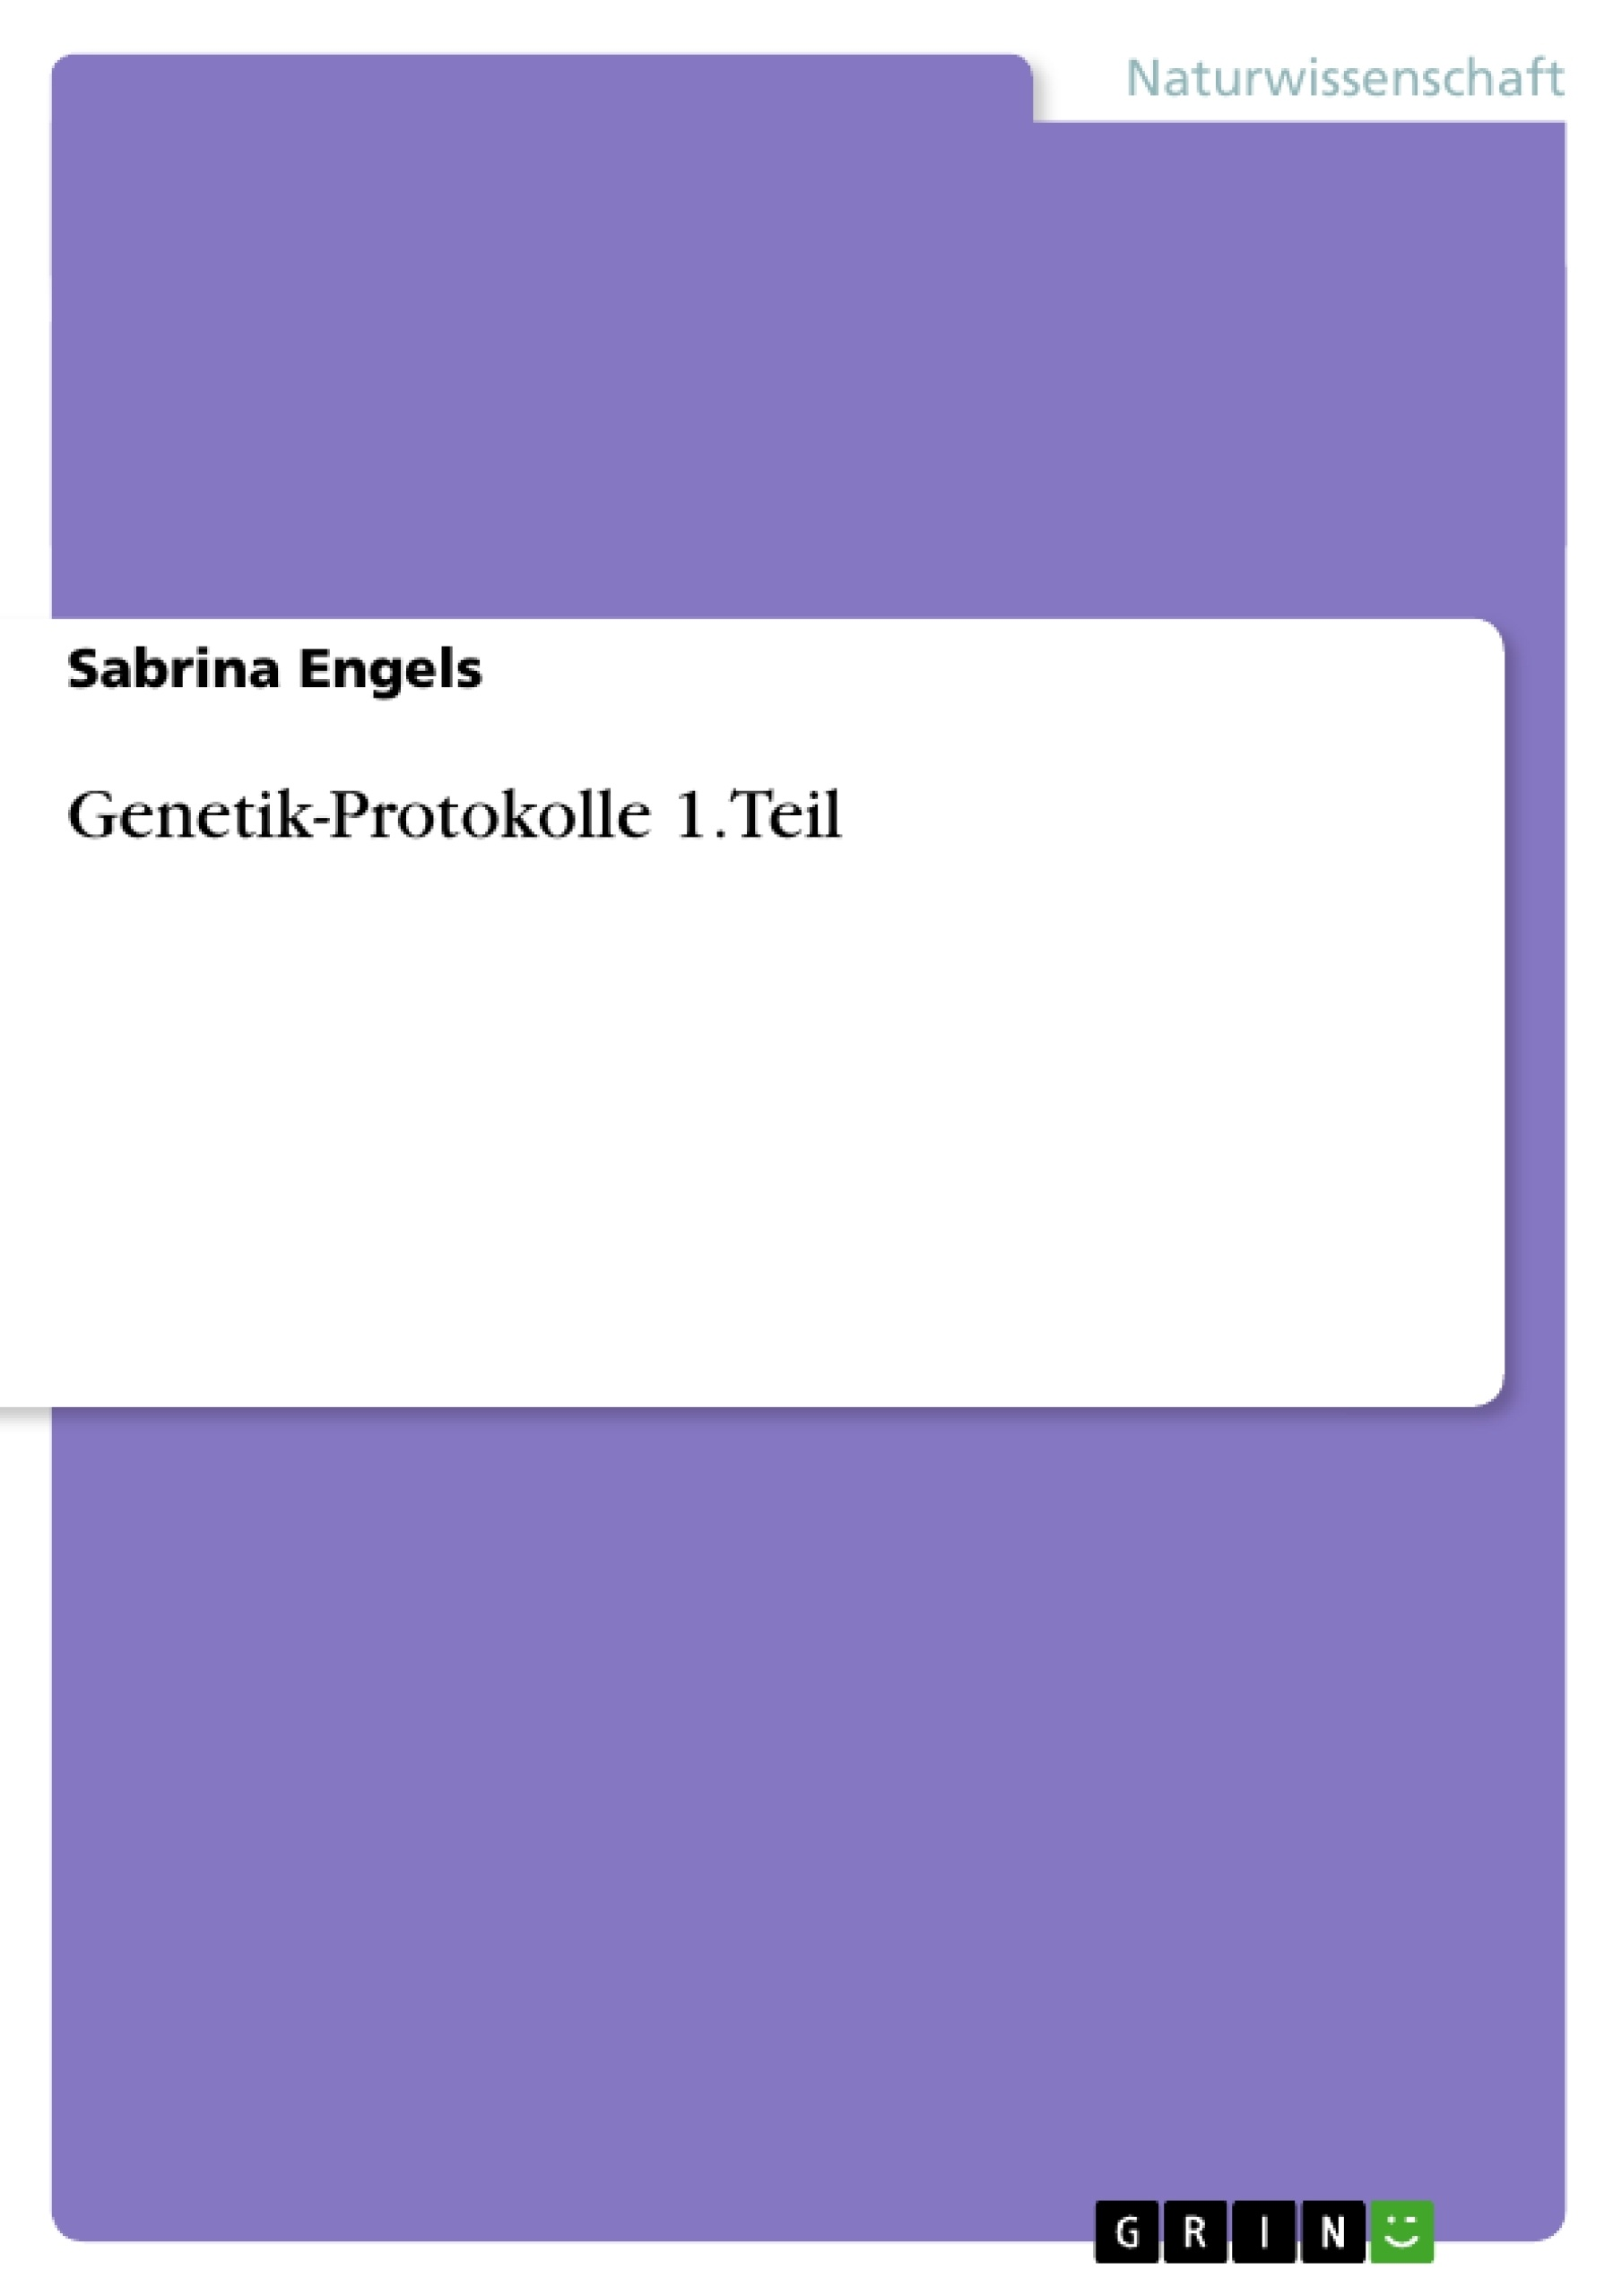 Titel: Genetik-Protokolle 1.Teil